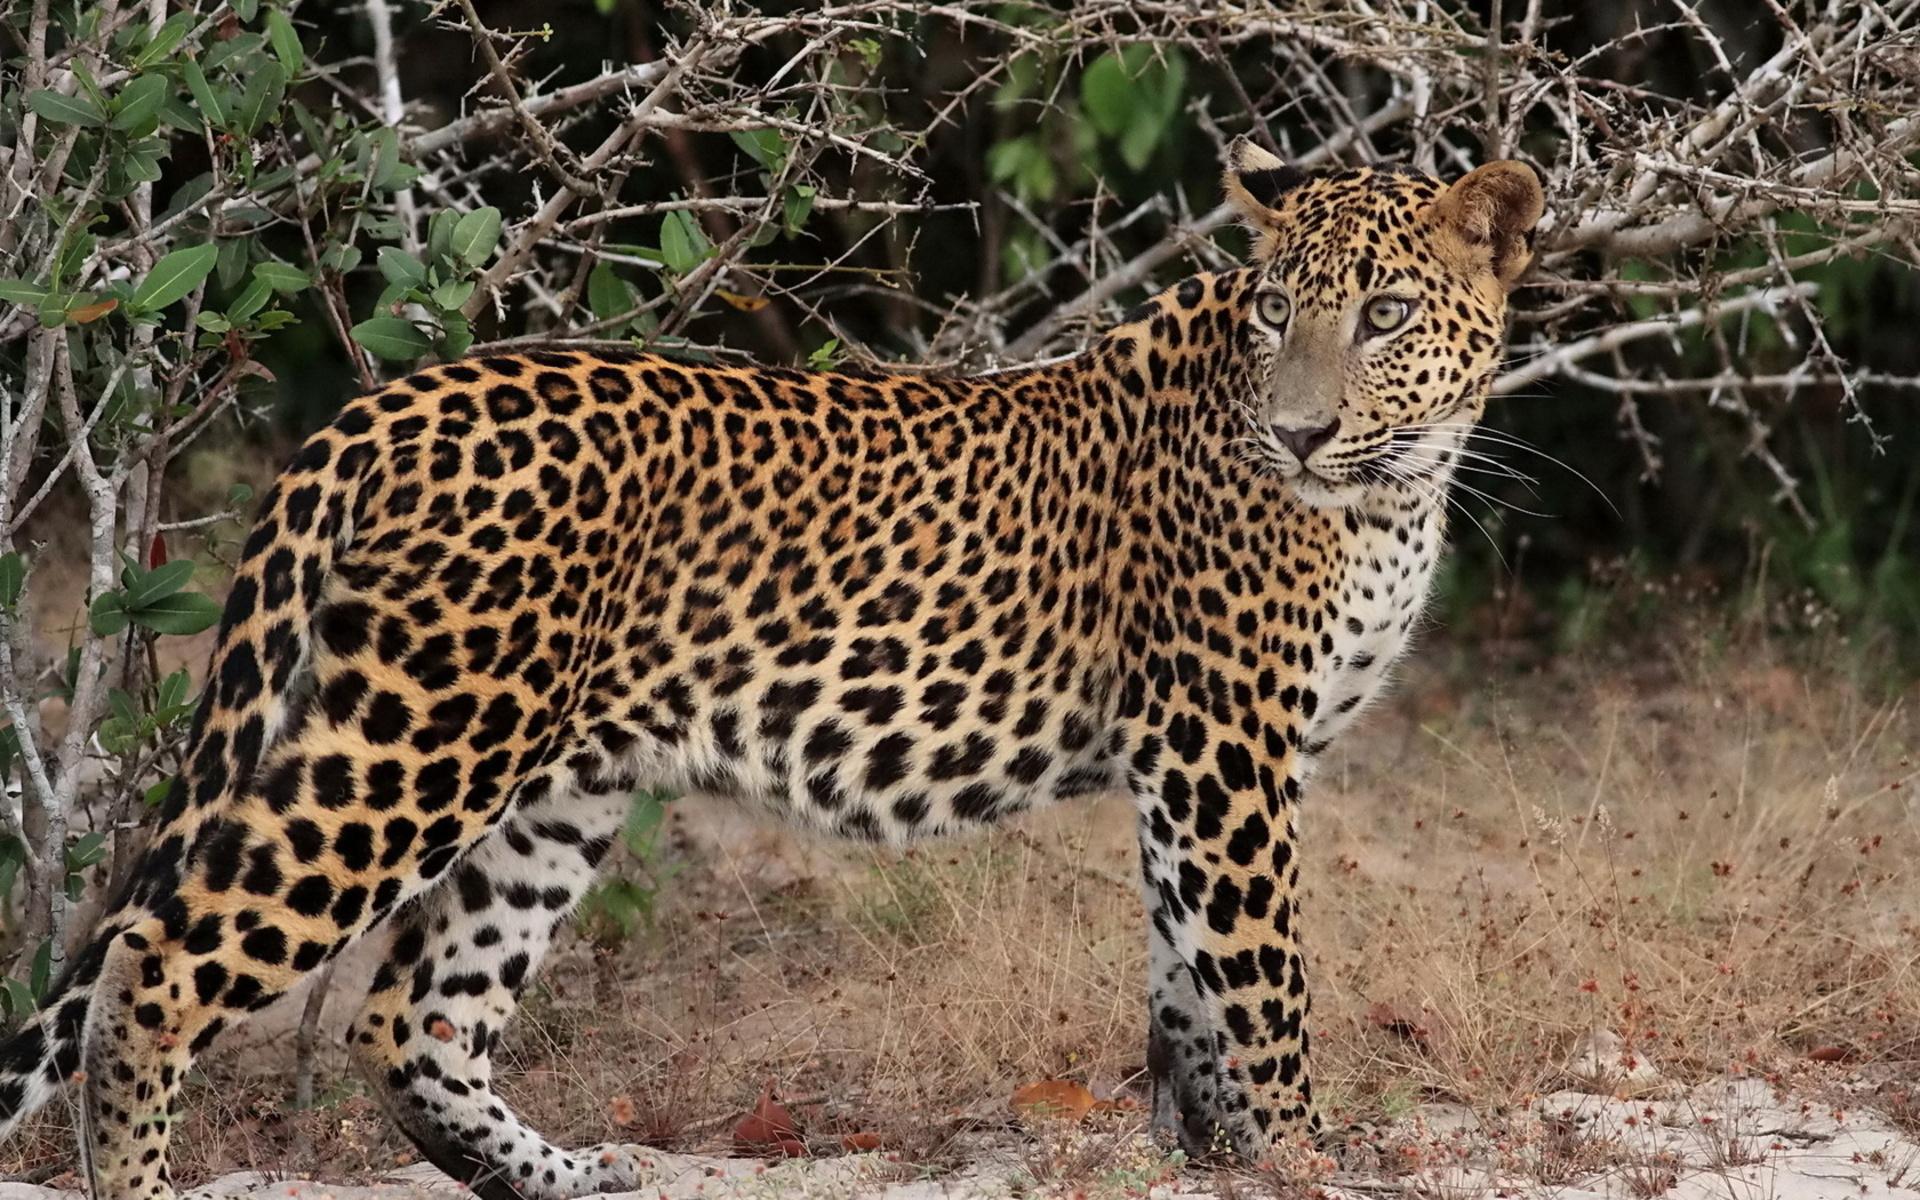 картинки гепарда и леопарда на рабочий стол